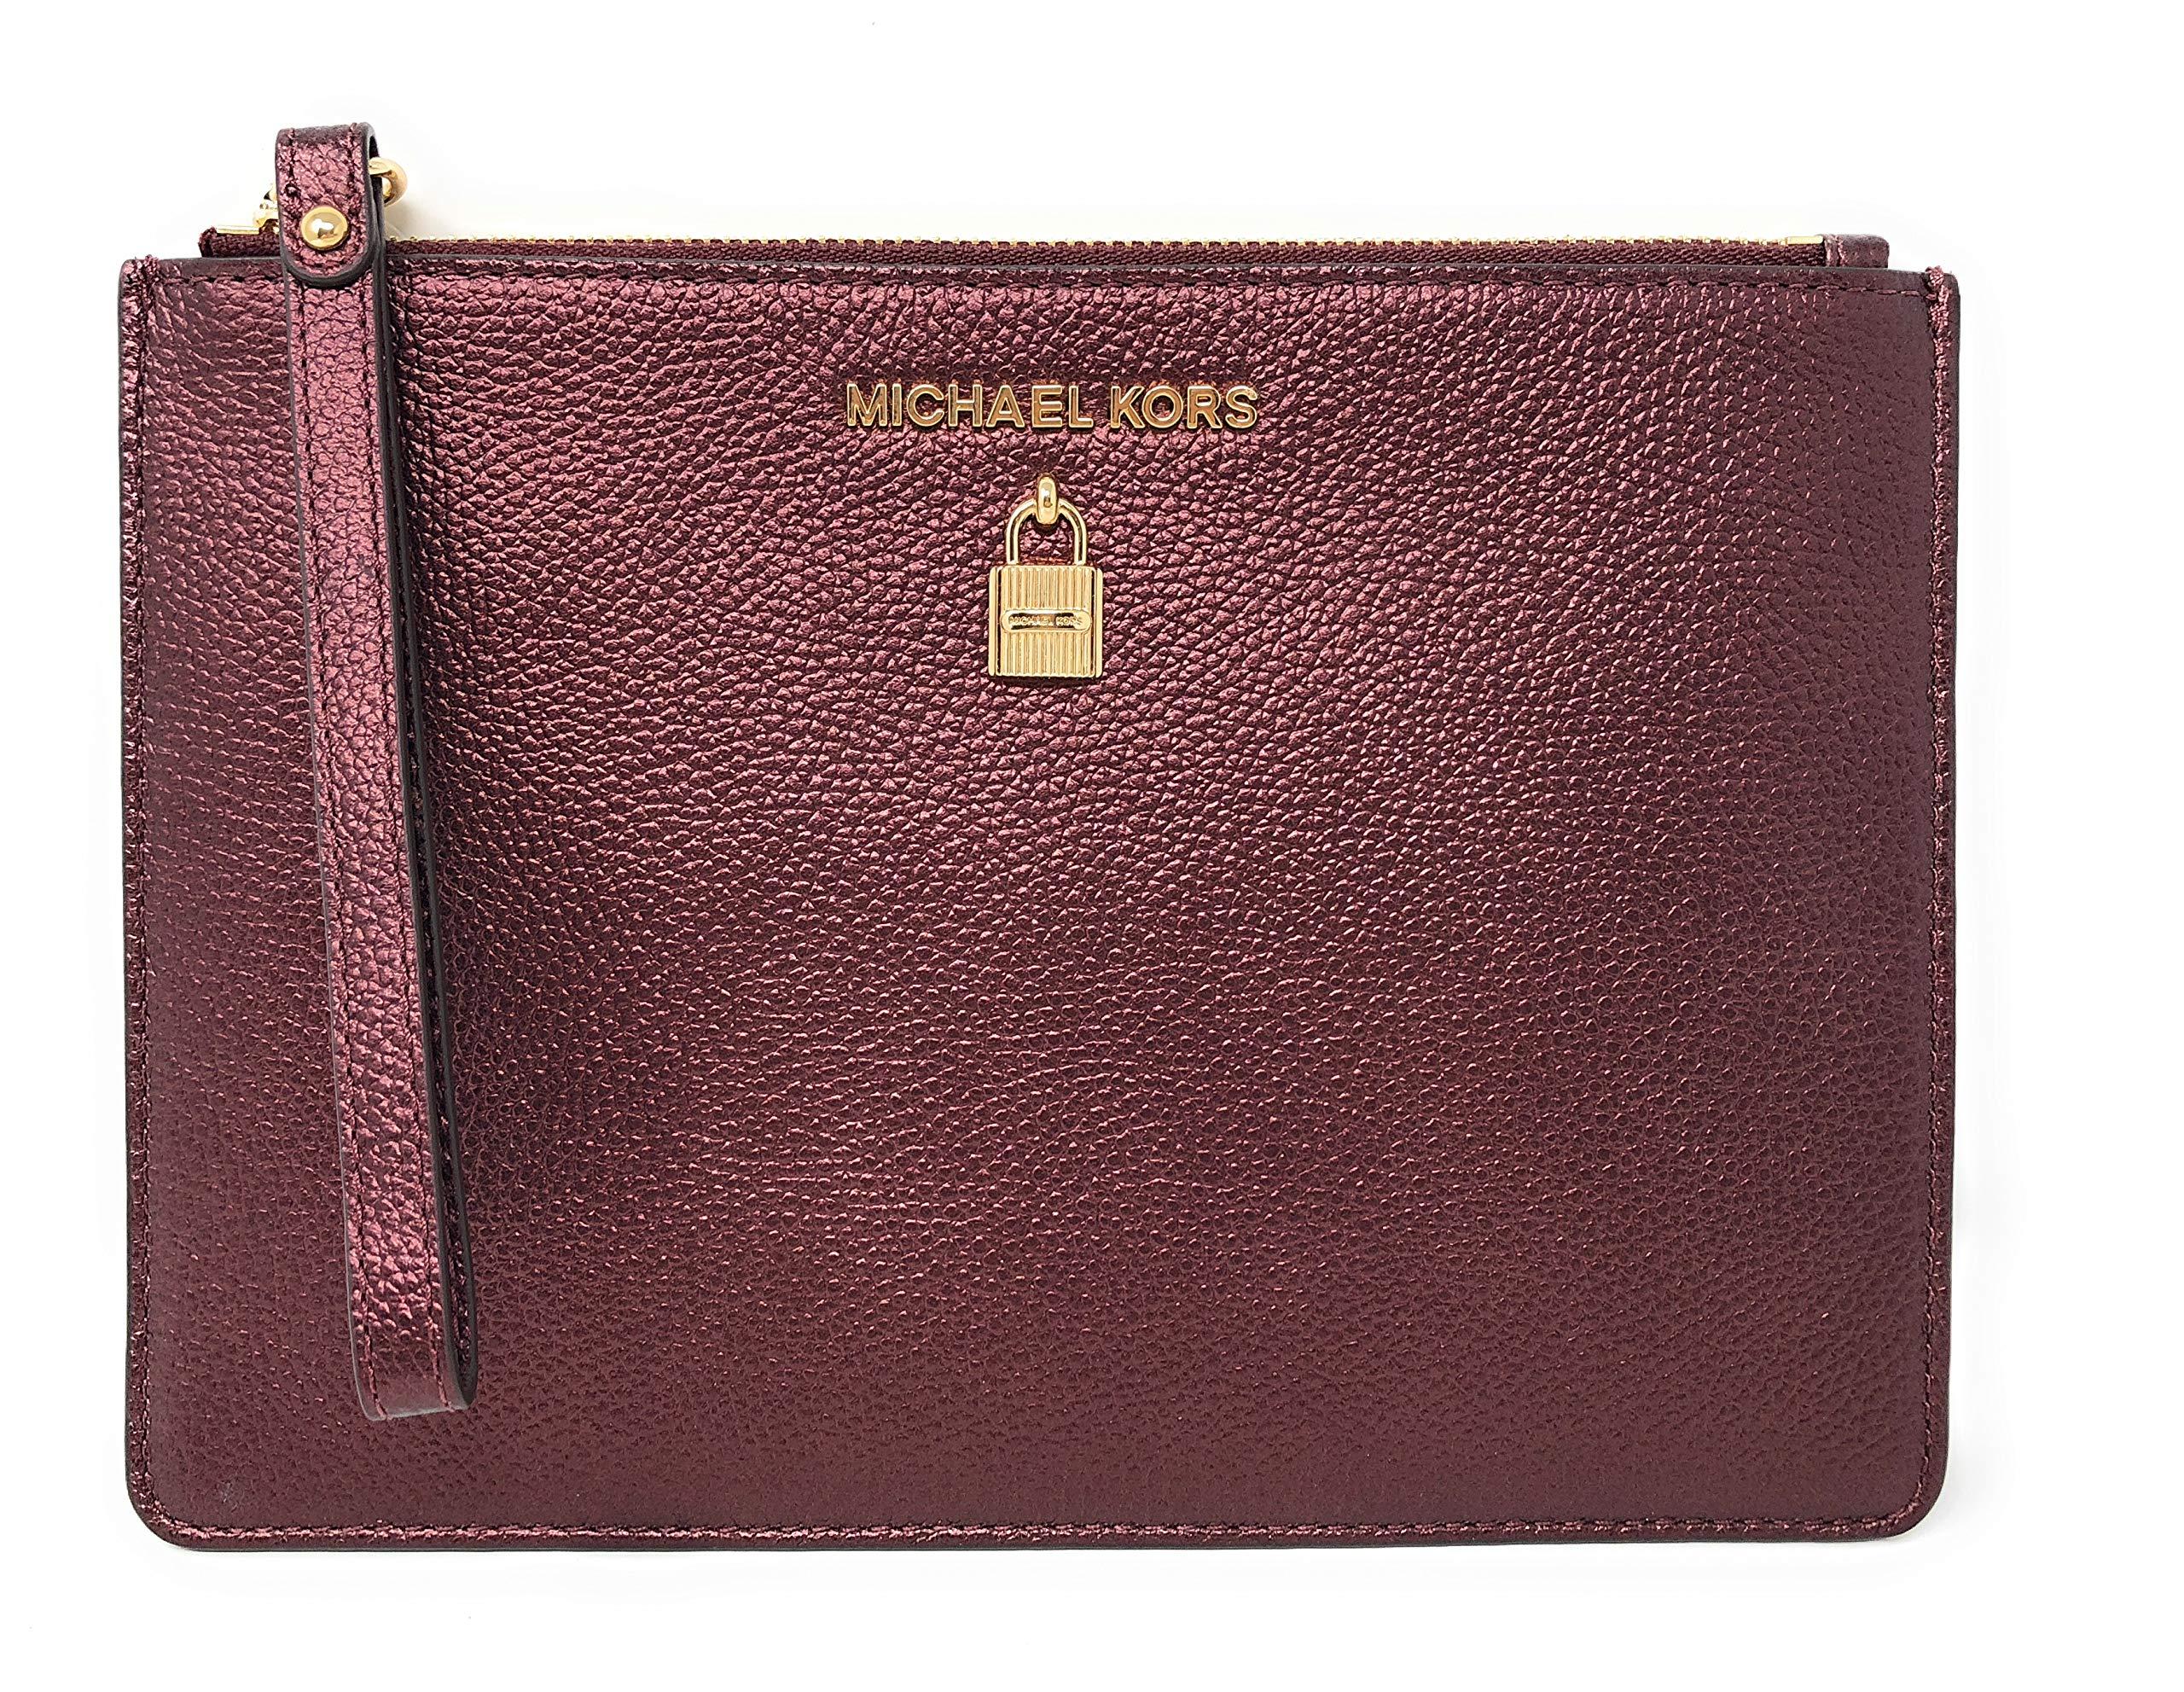 Michael Kors Adele XL Large Zip Leather Clutch Wristlet Purse in Merlot